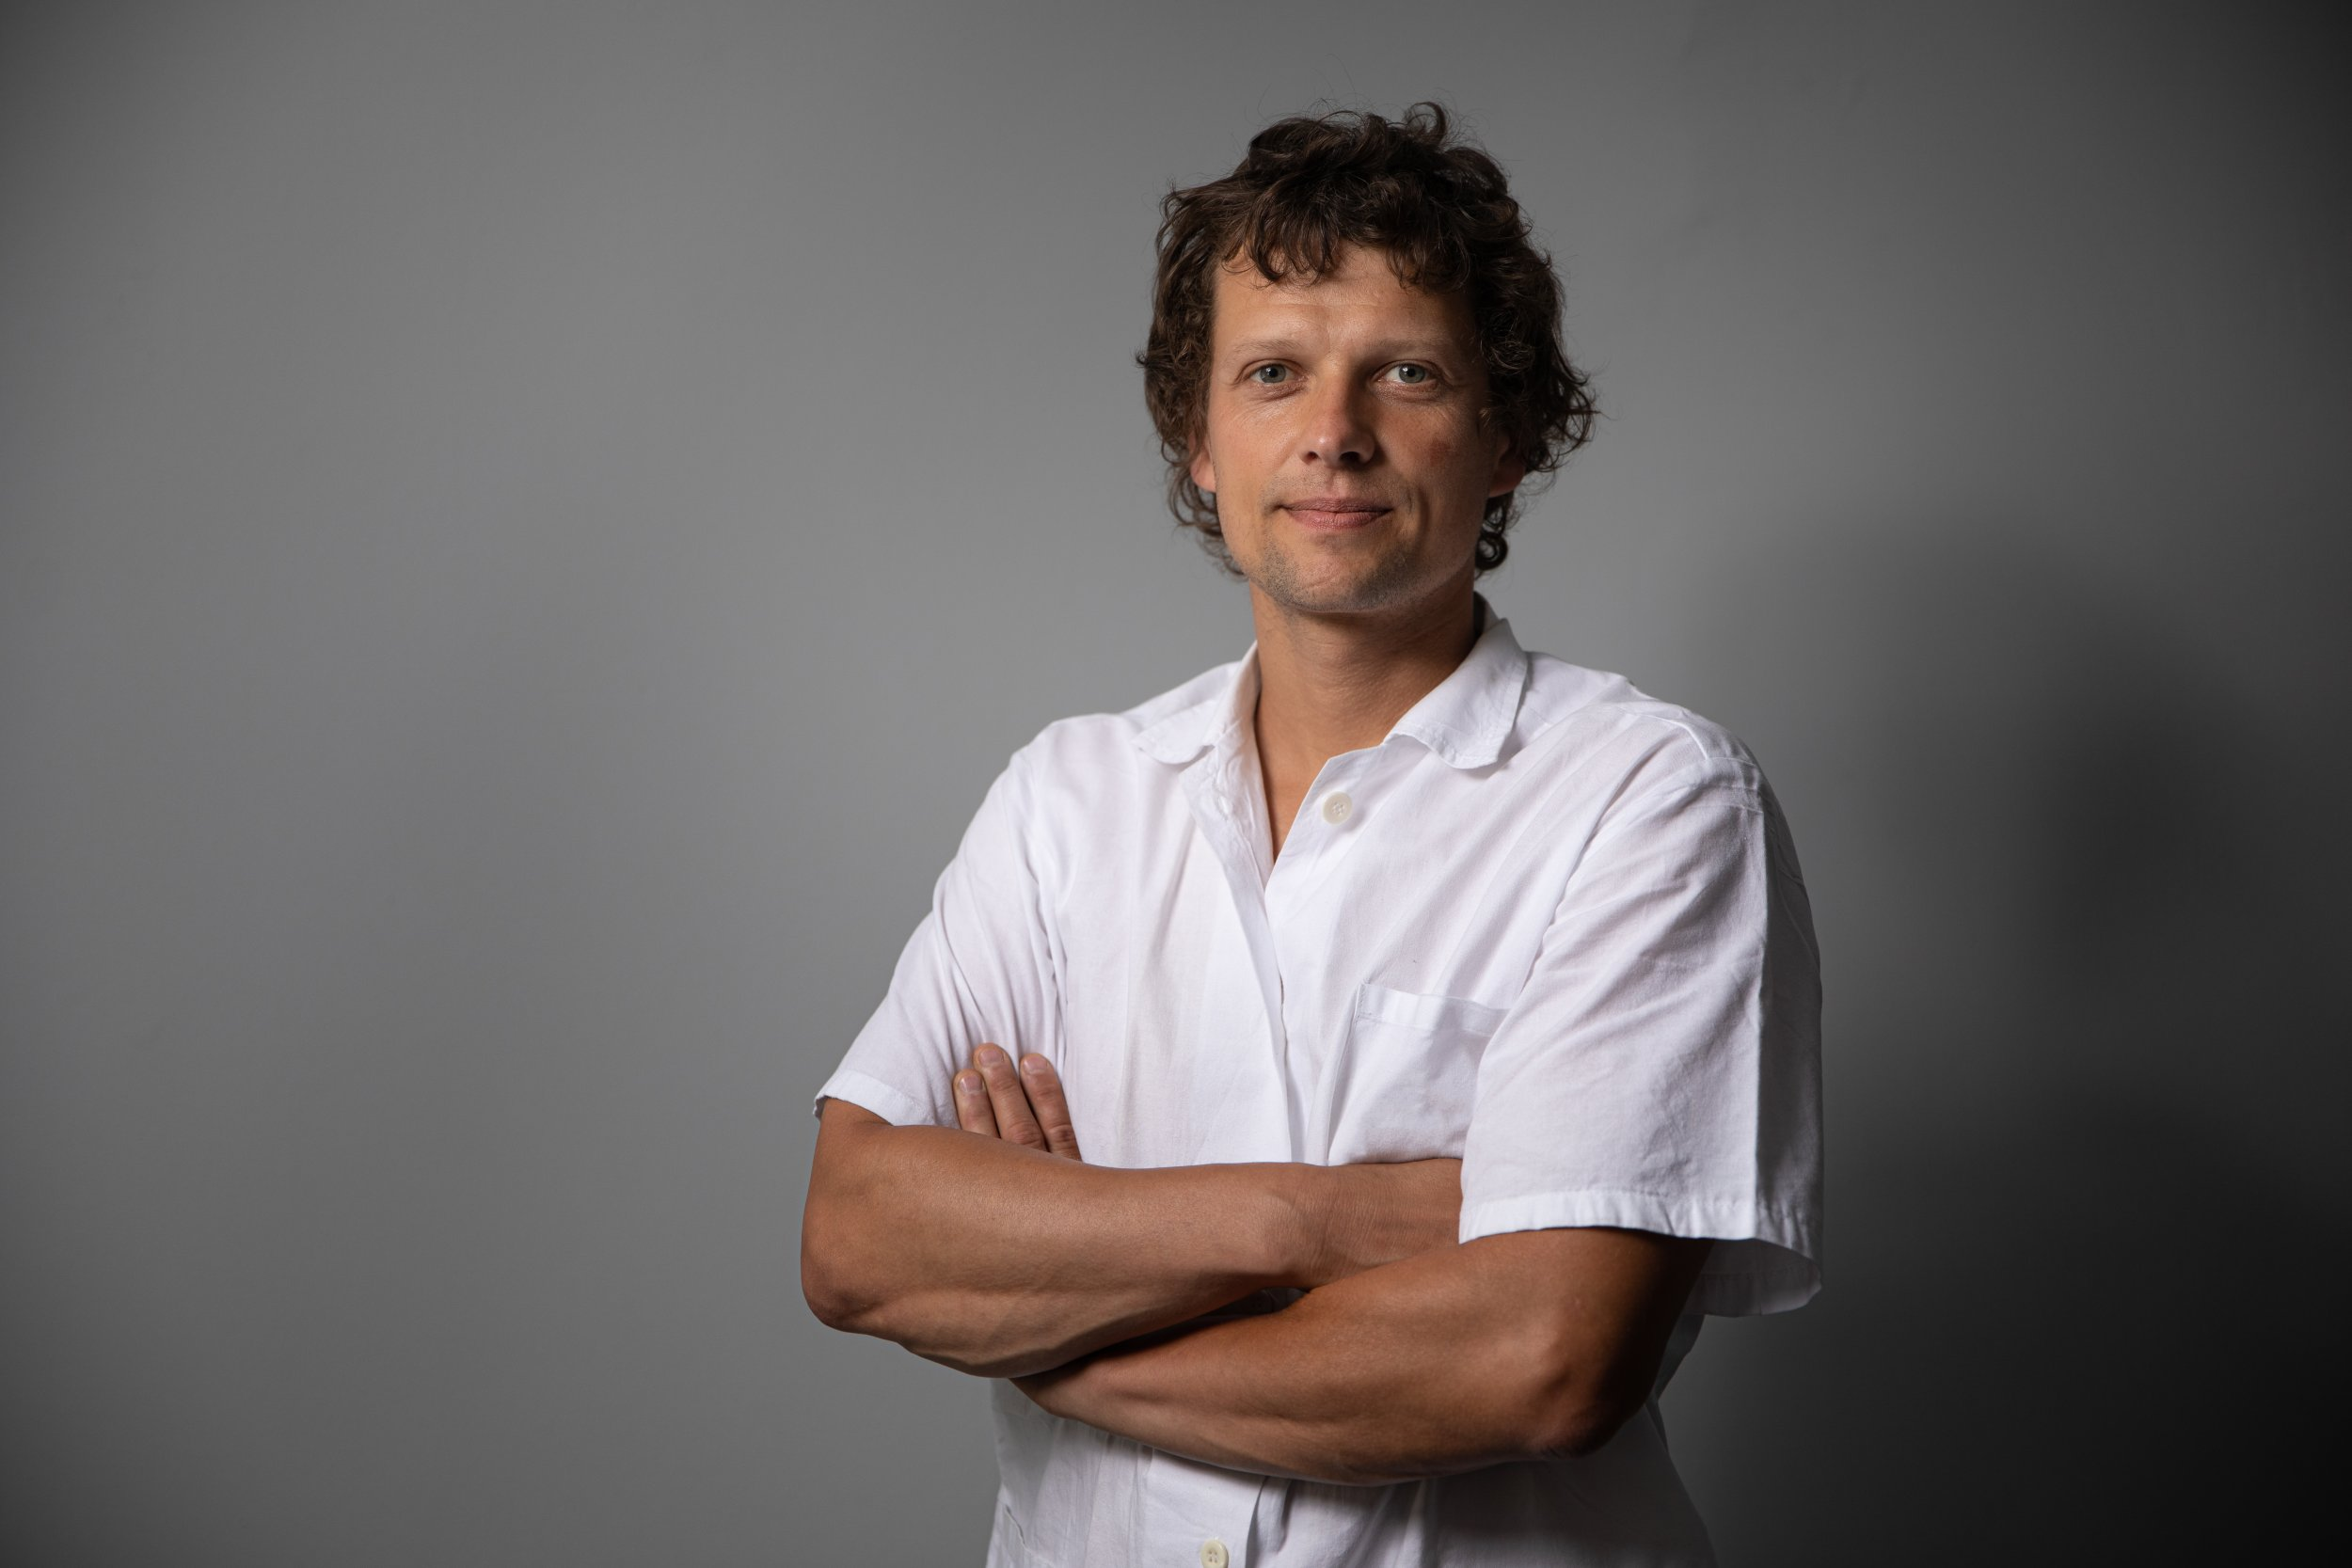 mgr. Jan Soucha